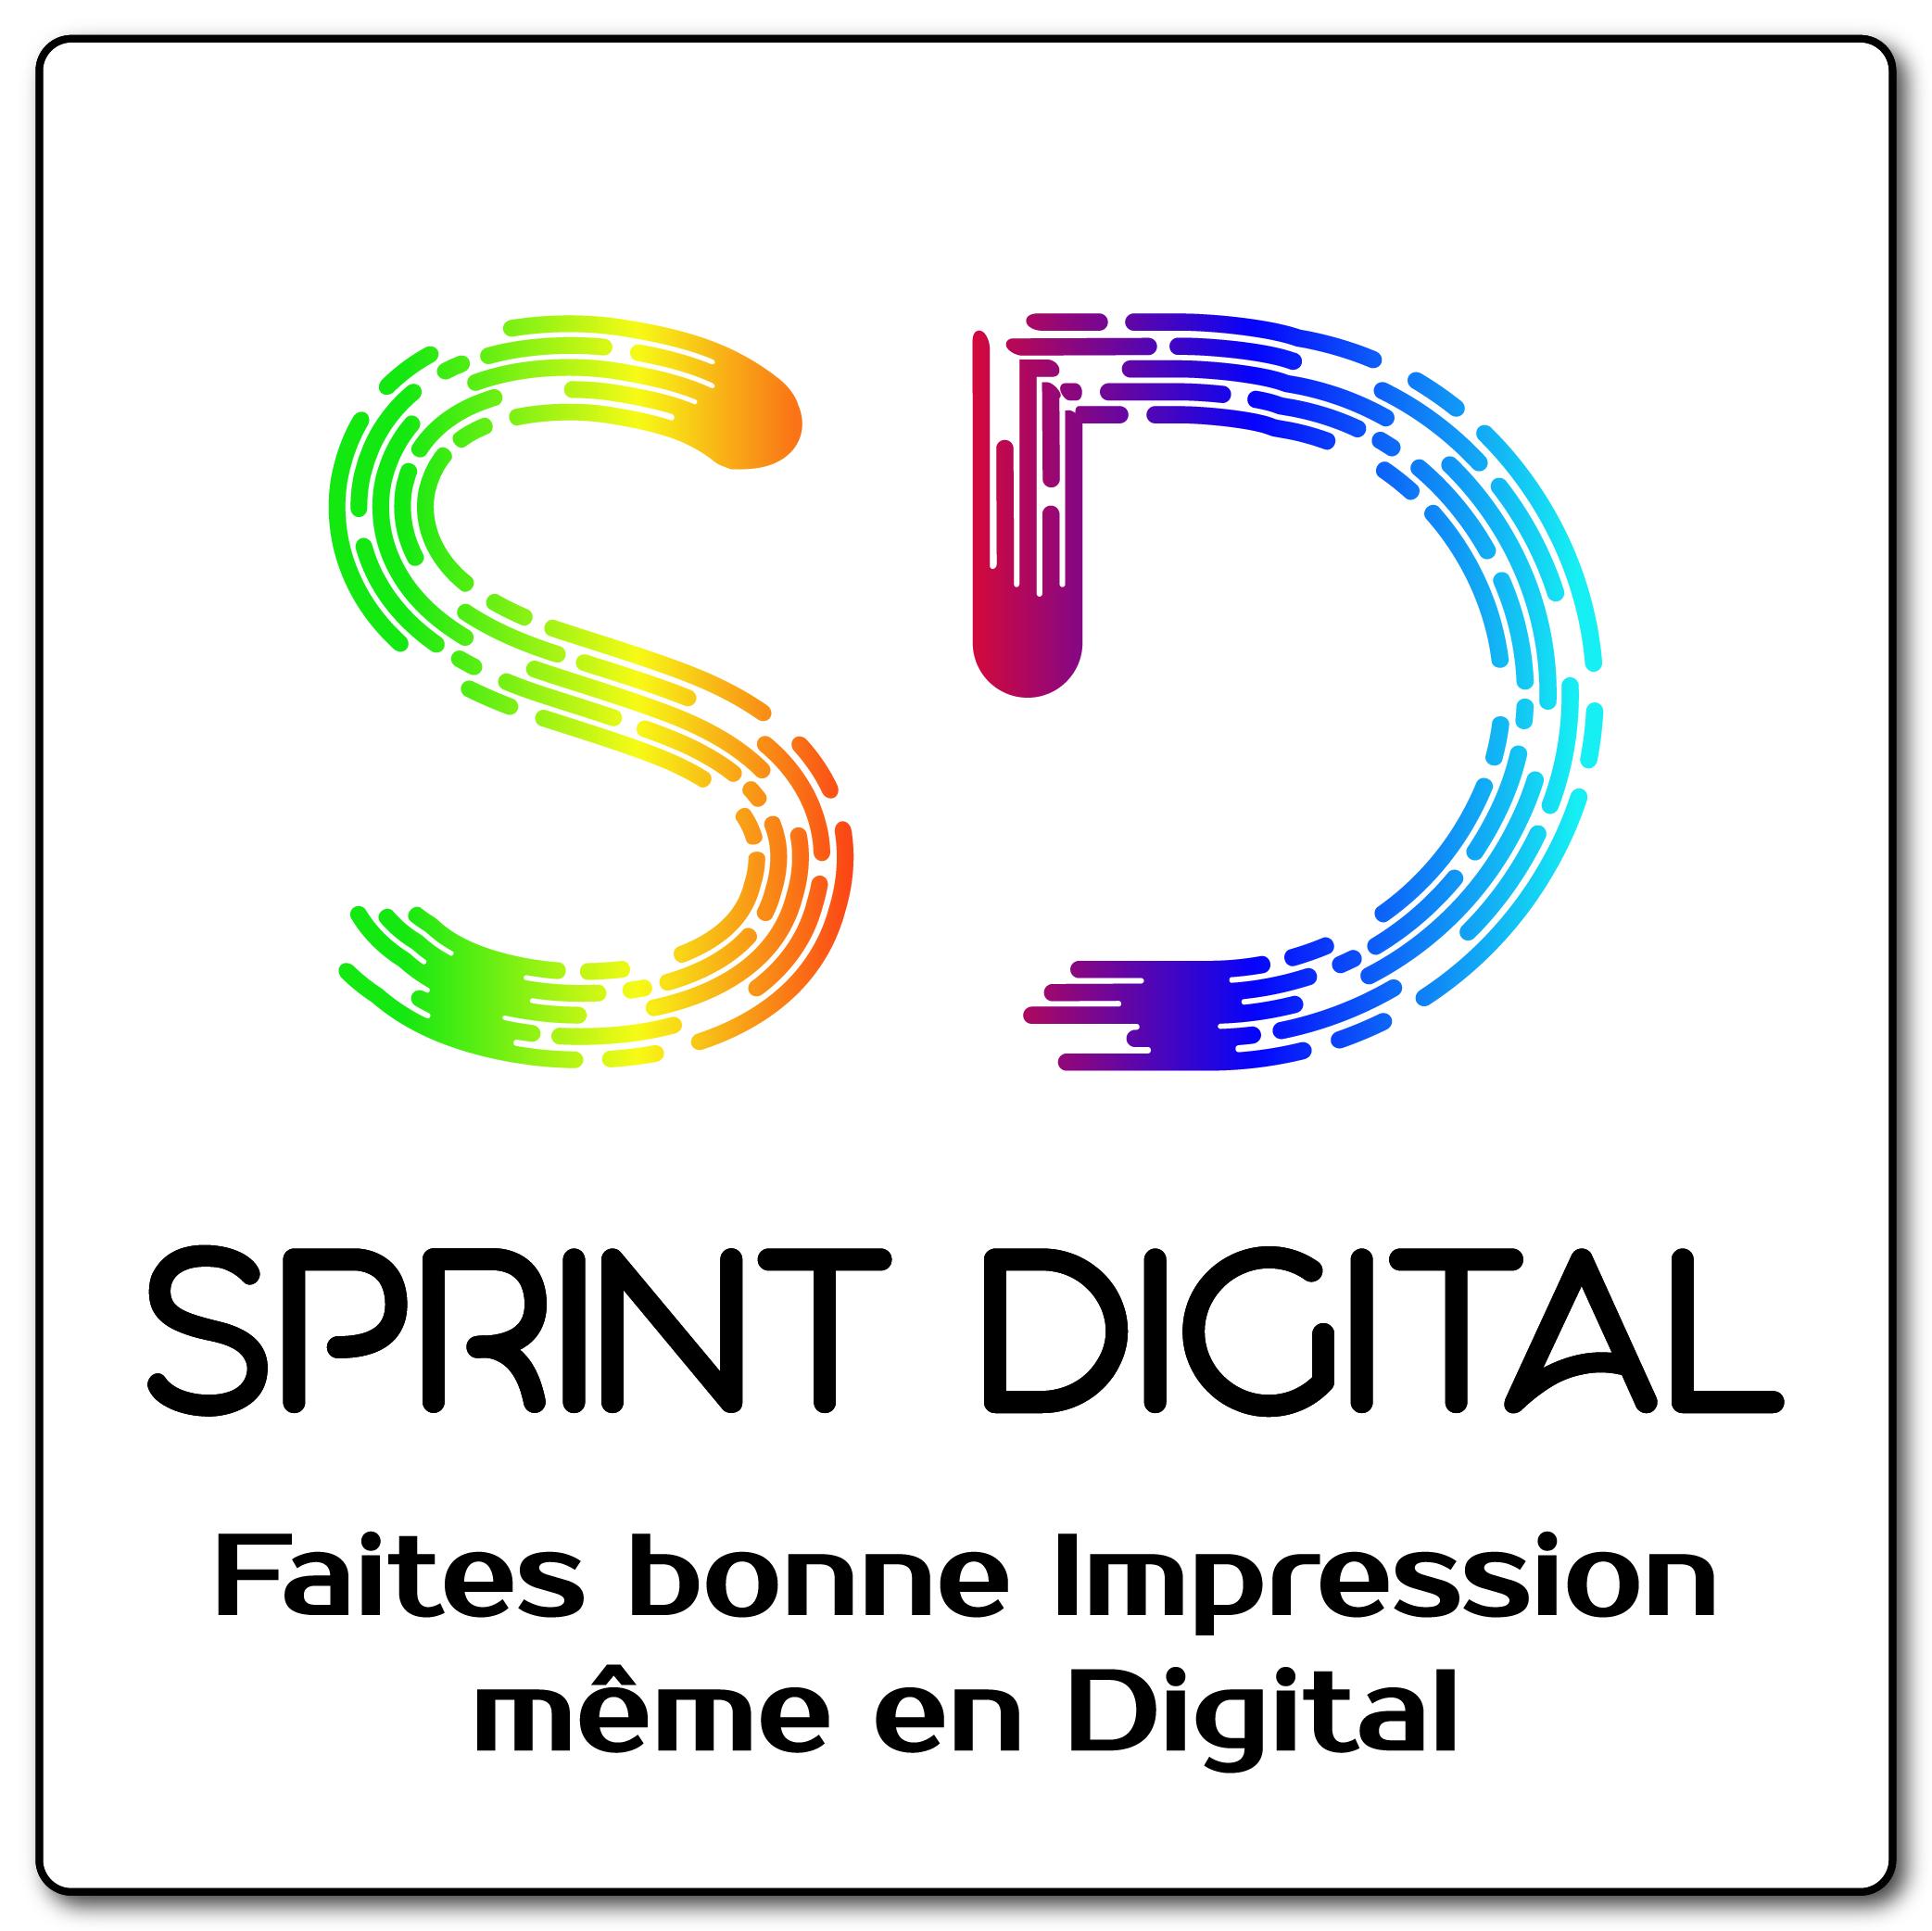 Sprint-digital